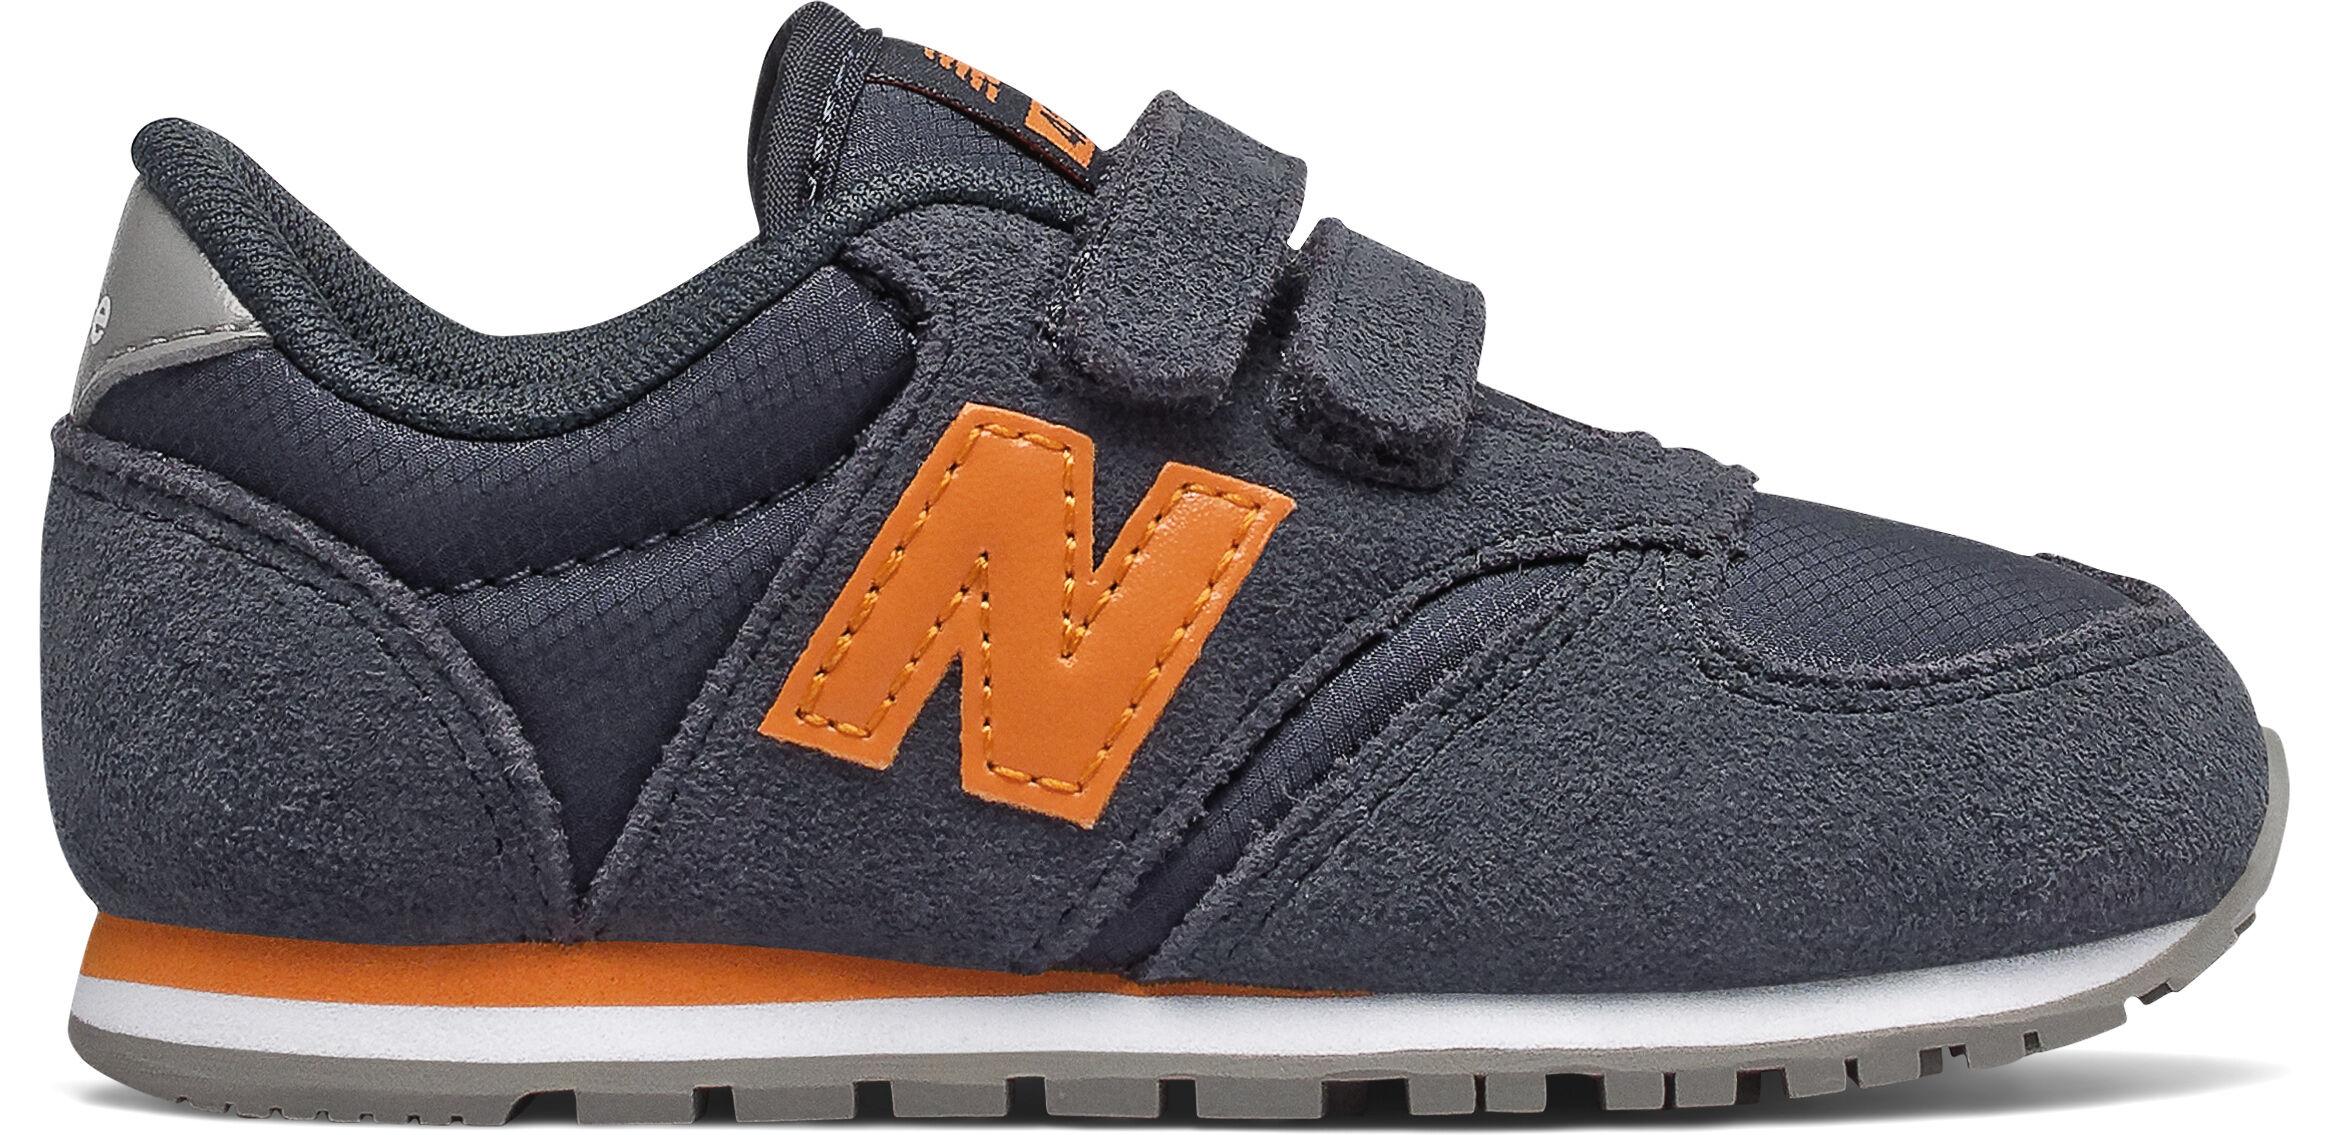 Outlet de sneakers New Balance 420 Intersport New Balance